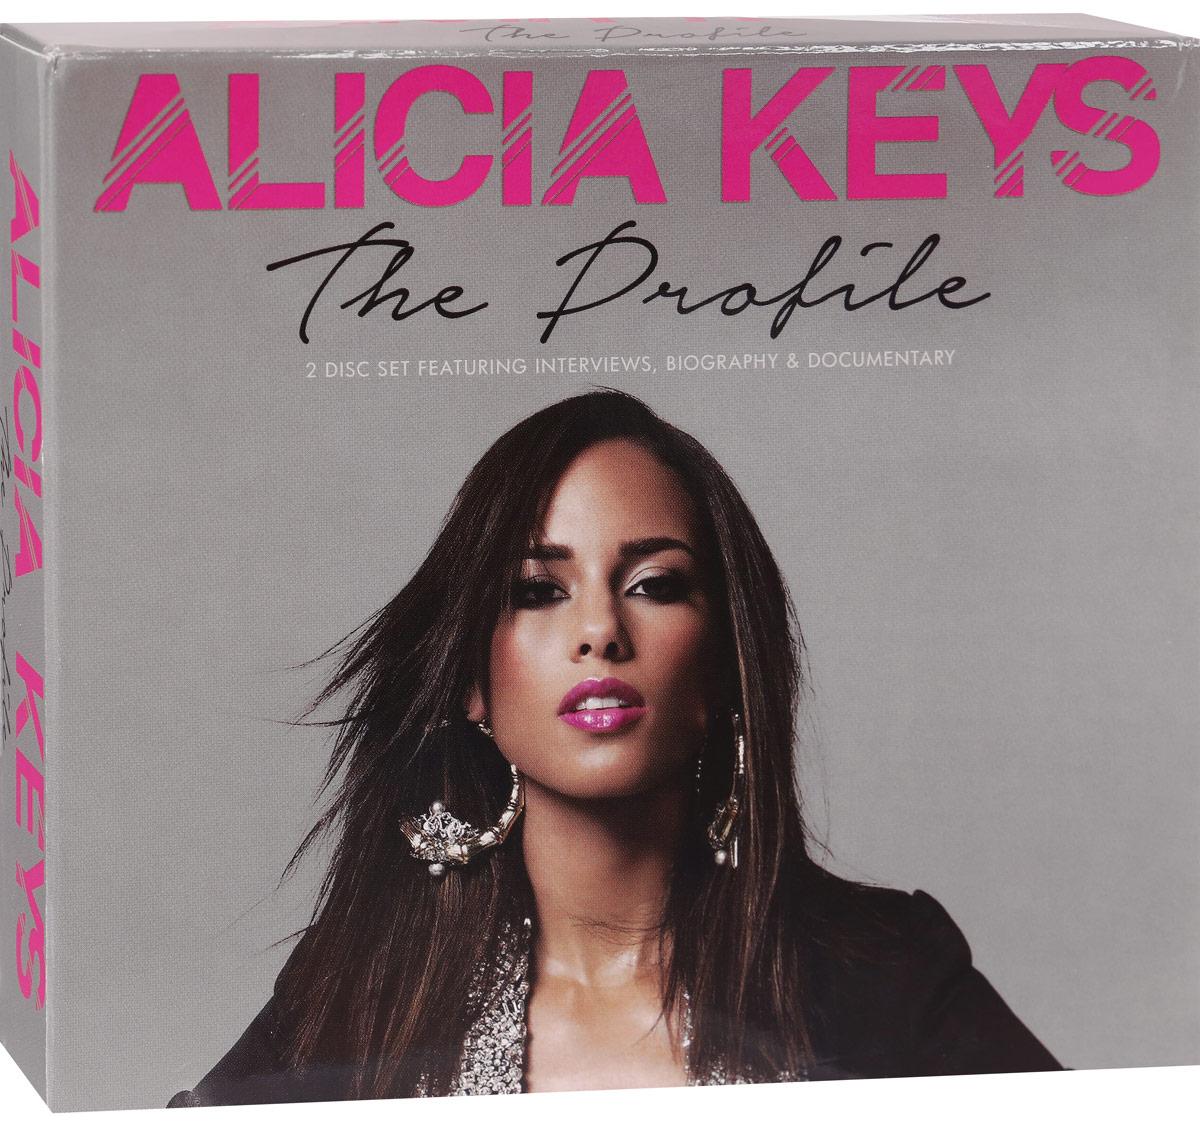 Фарелл Уильямс Alicia Keys. The Profile (2 CD) цена 2017